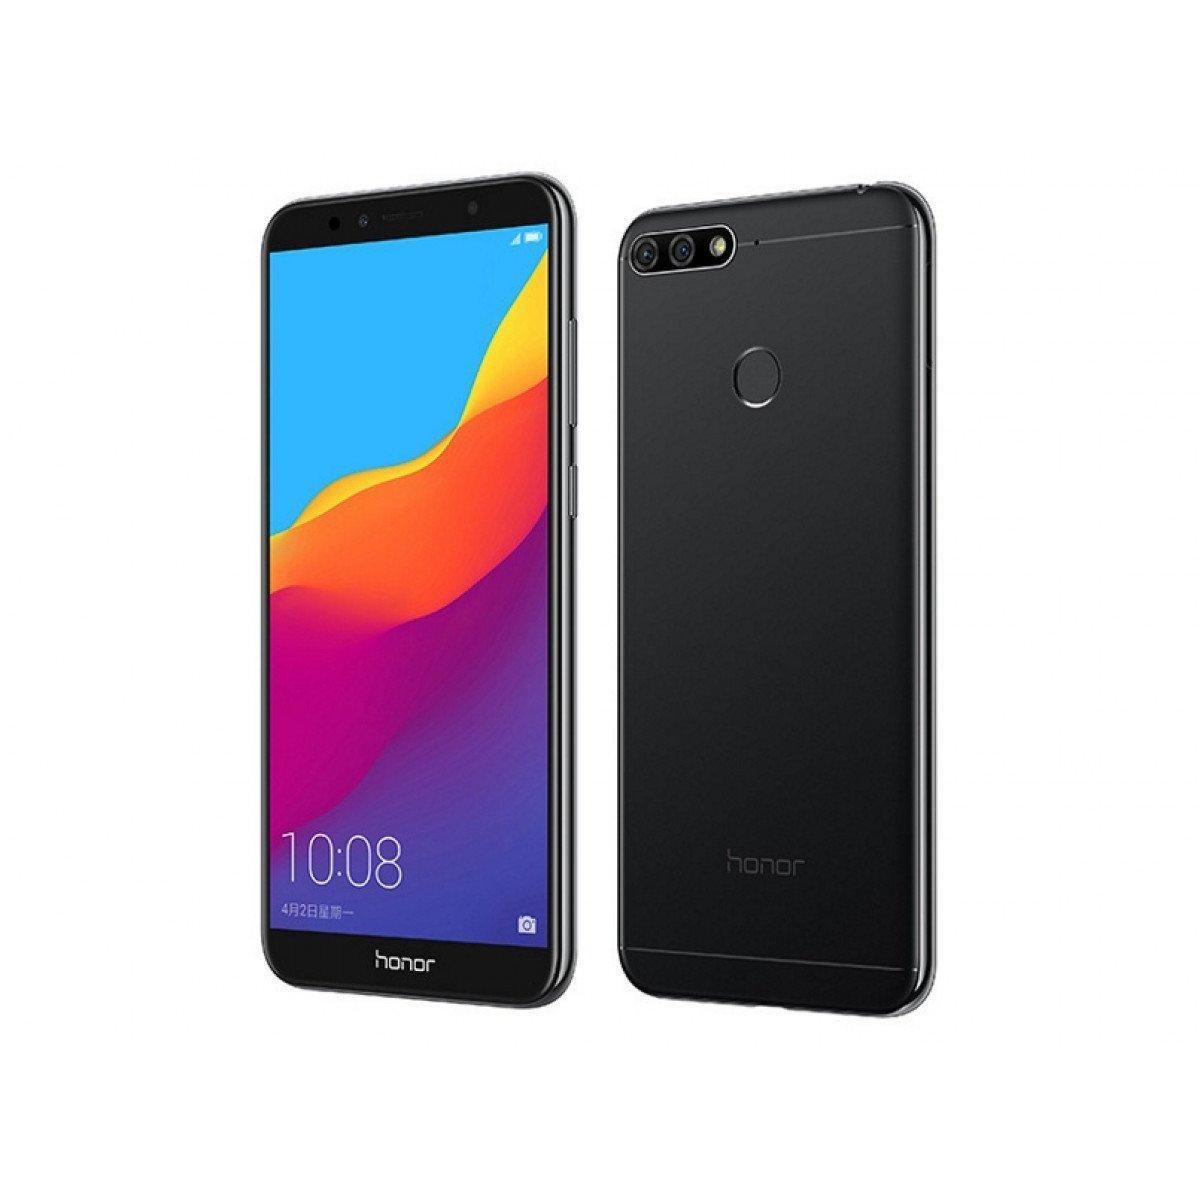 Điện thoại Huawei Honor 7A